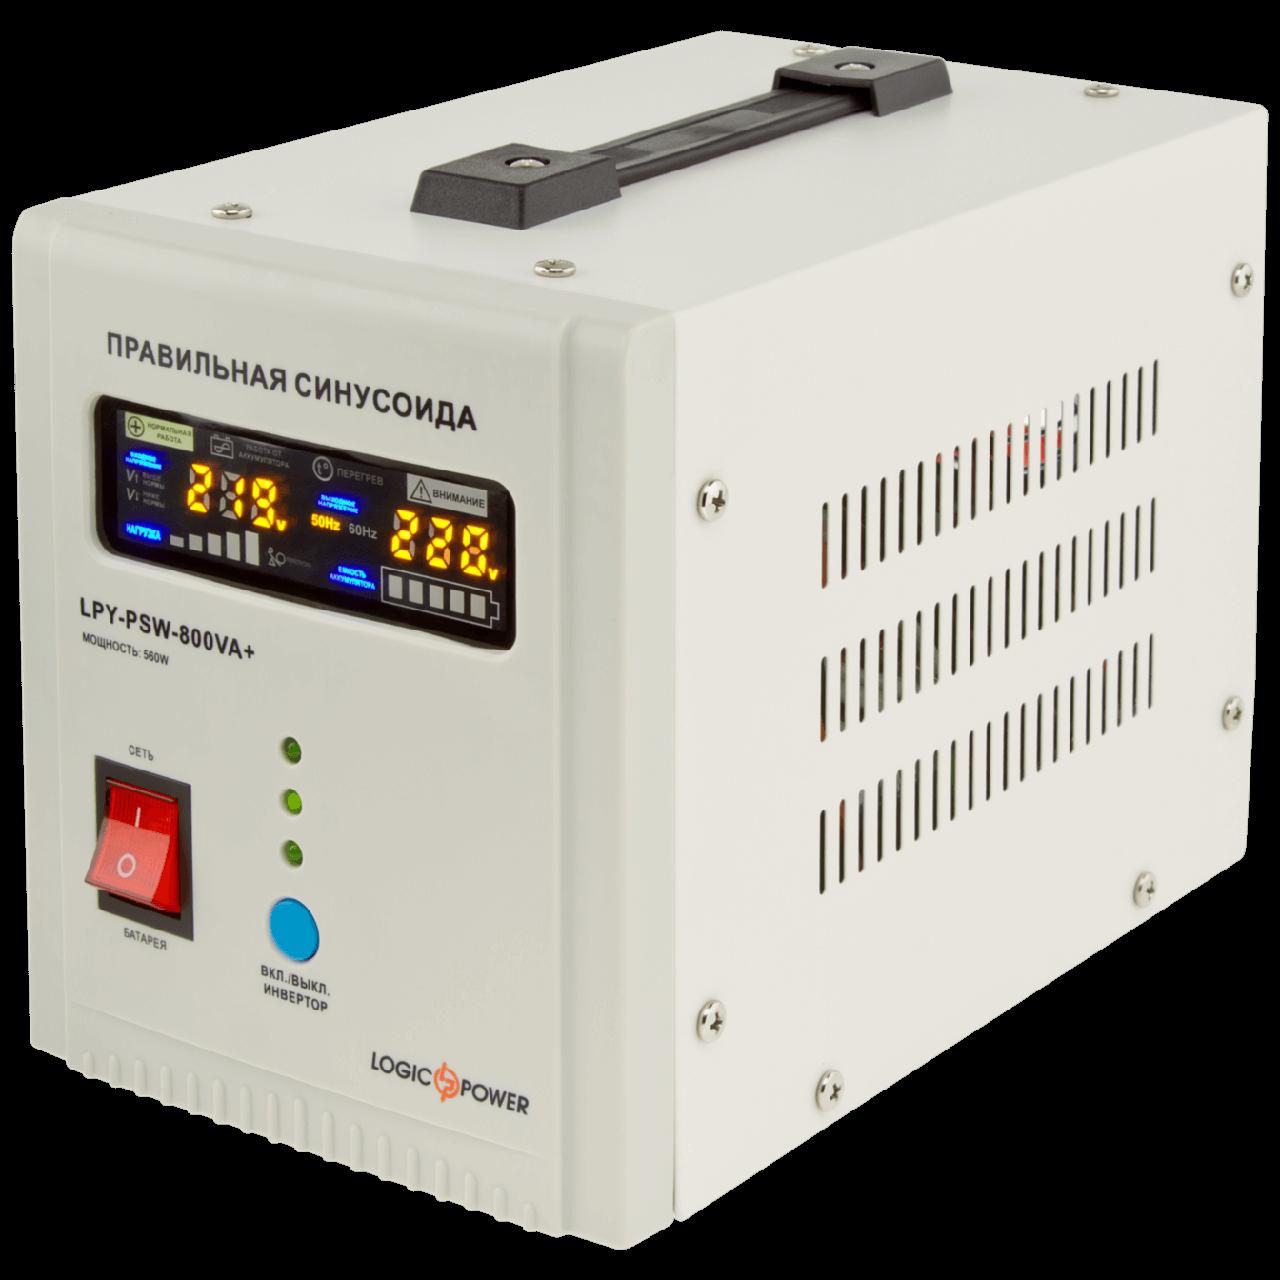 ИБП LPY- PSW-800VA+ (560Вт) 5A/15A 12Вт, правильная синусоида